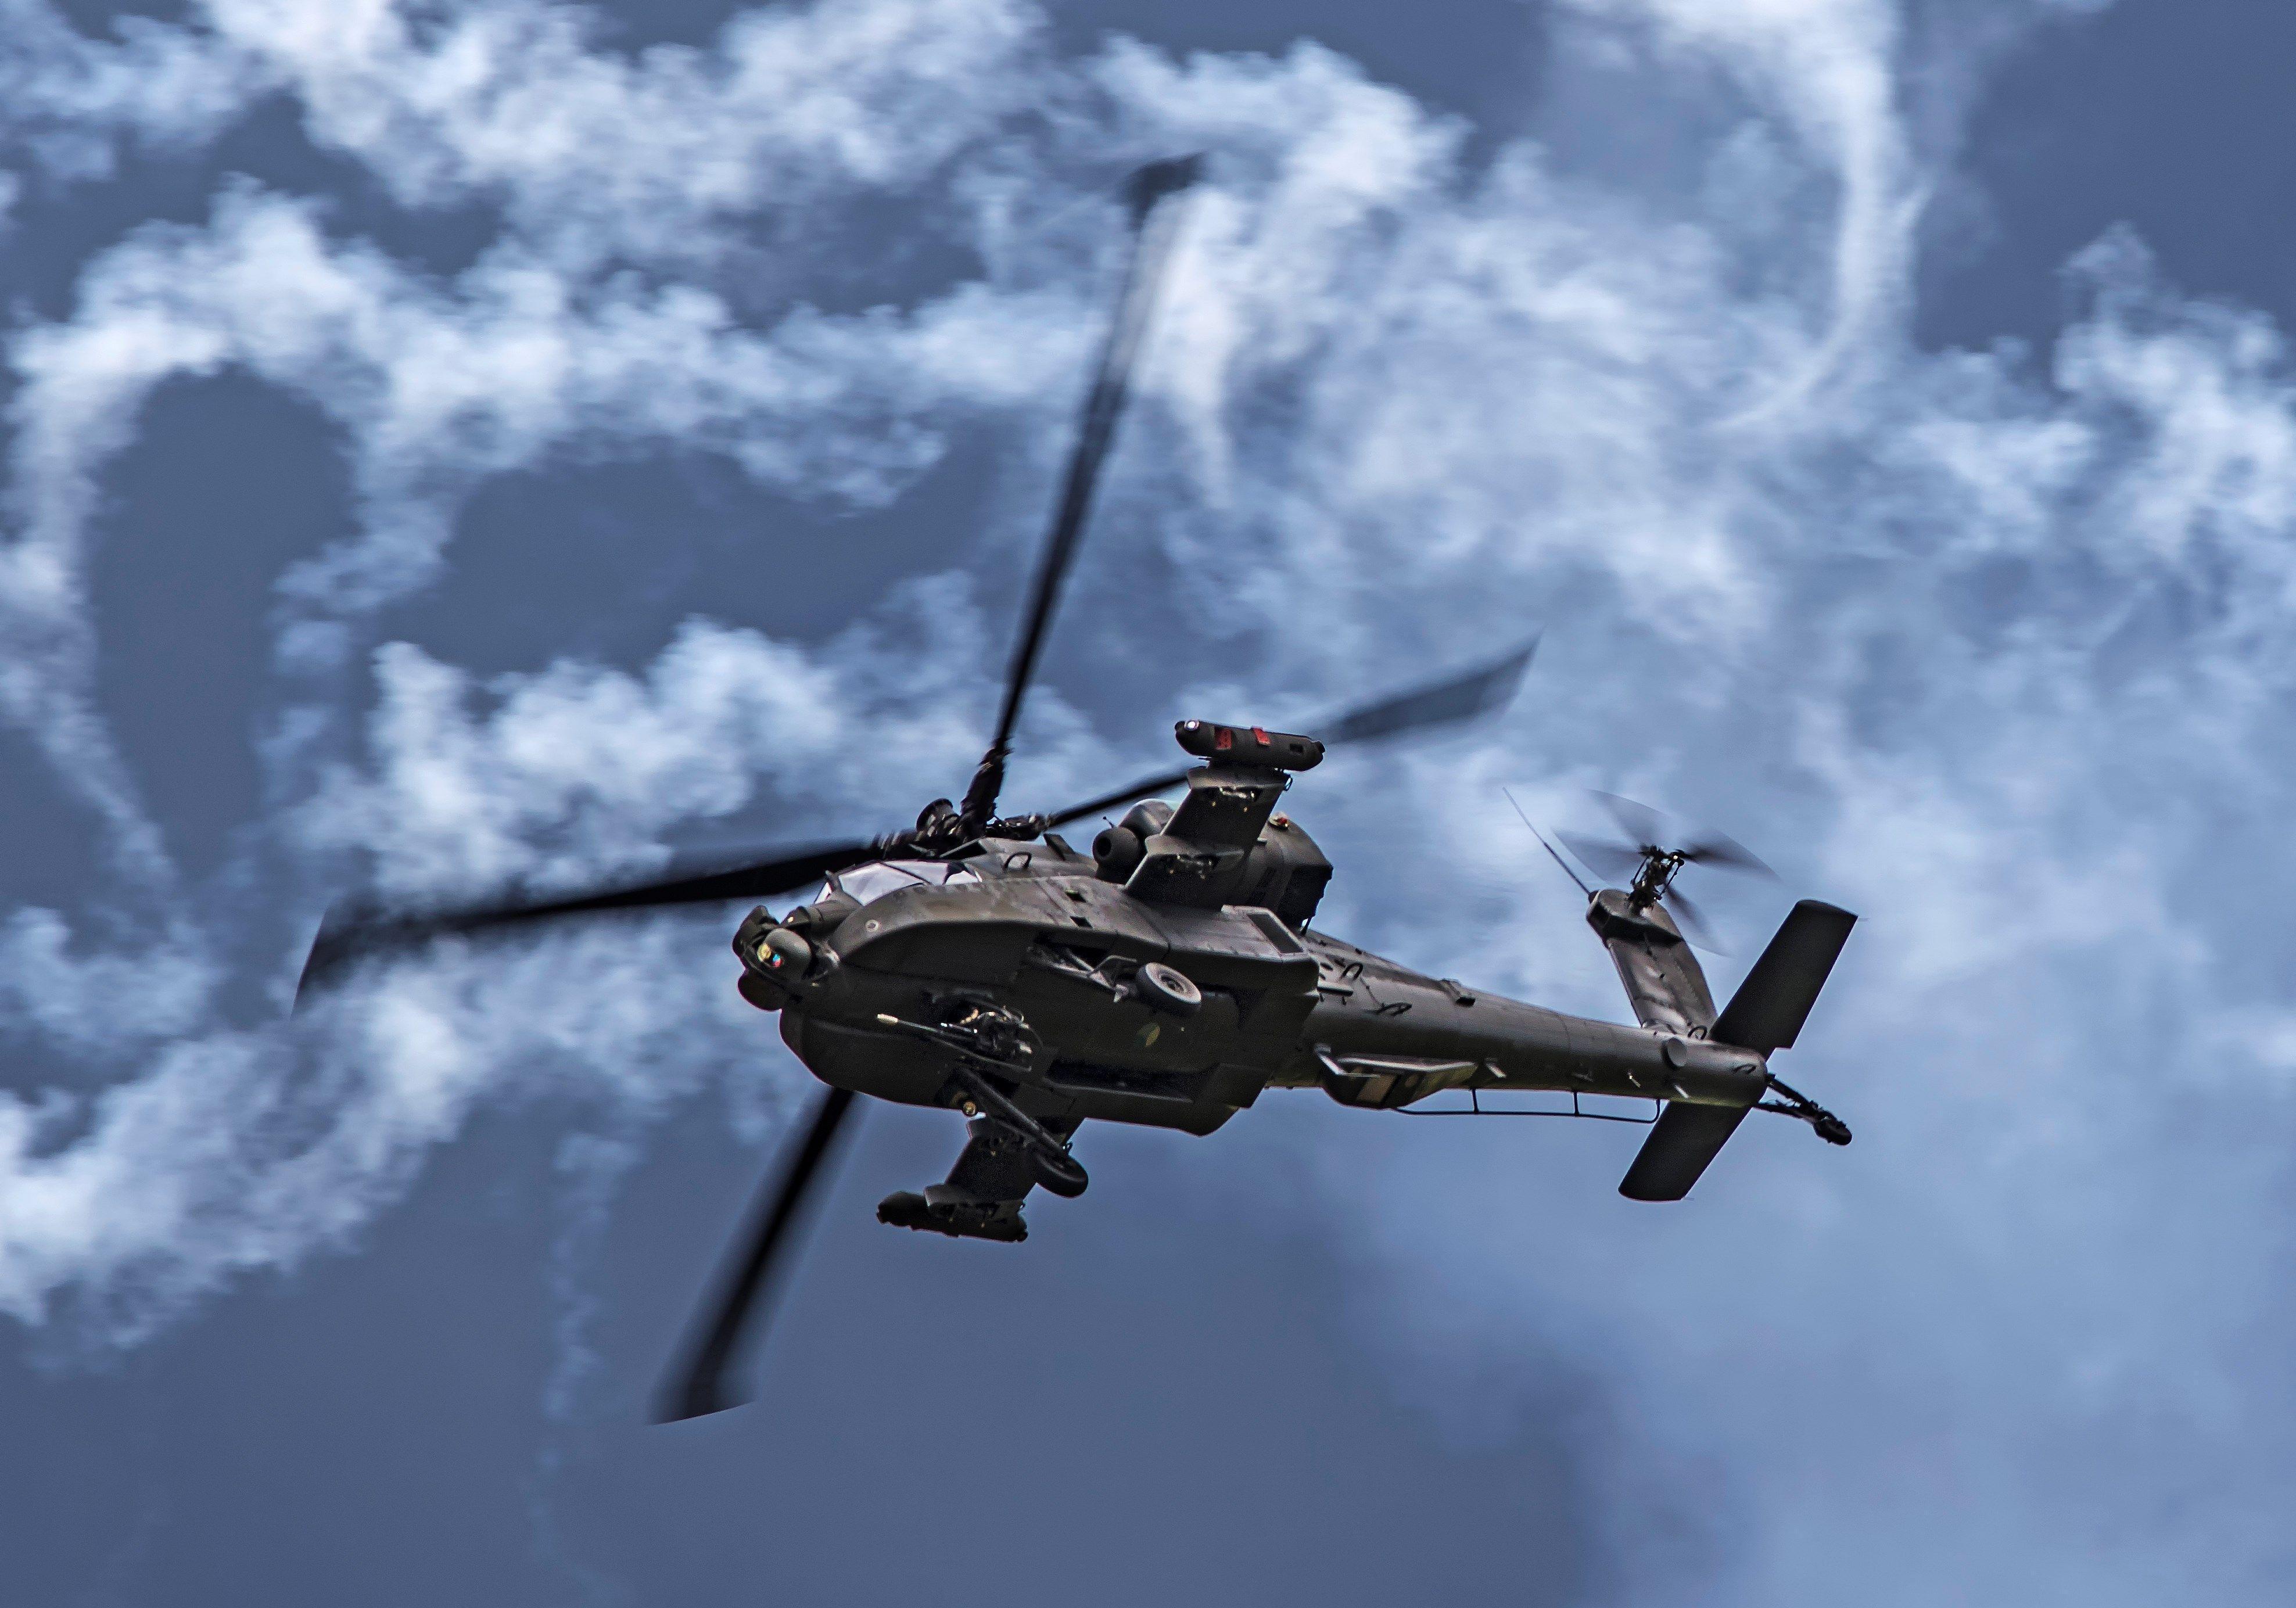 Apache Helicopter Wallpaper Desktop: Boeing AH-64 Apache Wallpapers